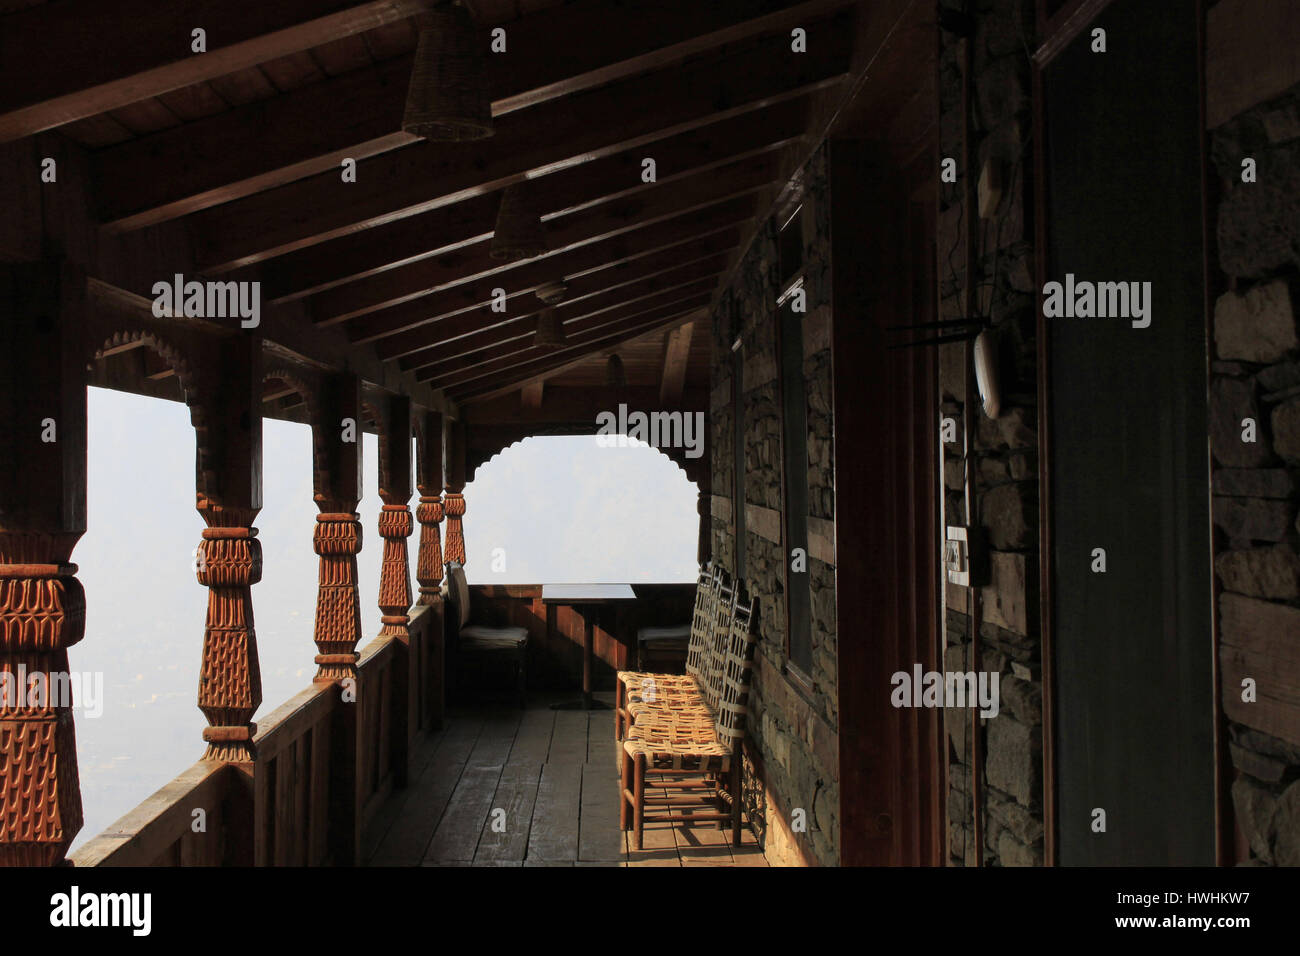 Corridor inside Naggar castle, Kulu Manali, Himachal Pradesh, India - Stock Image